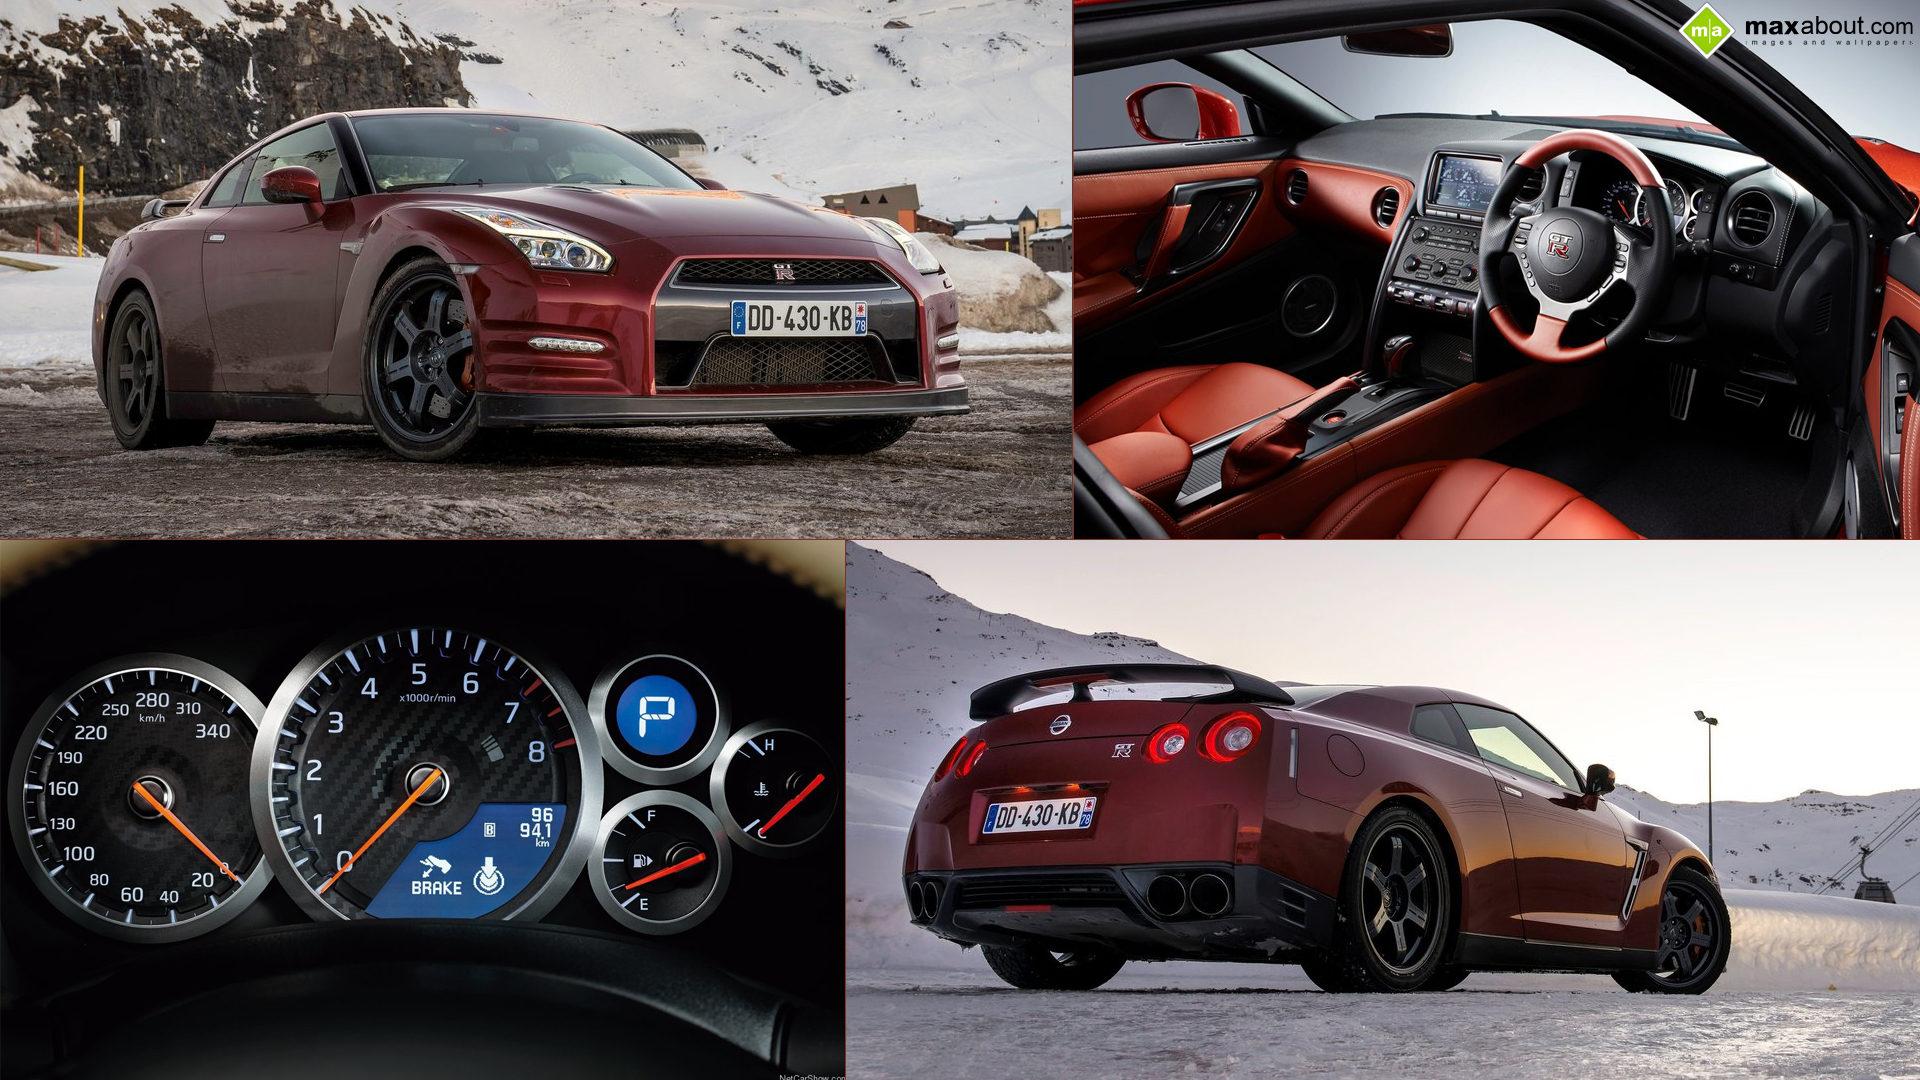 2015 Nissan GT R wallpaper   1136646 1920x1080